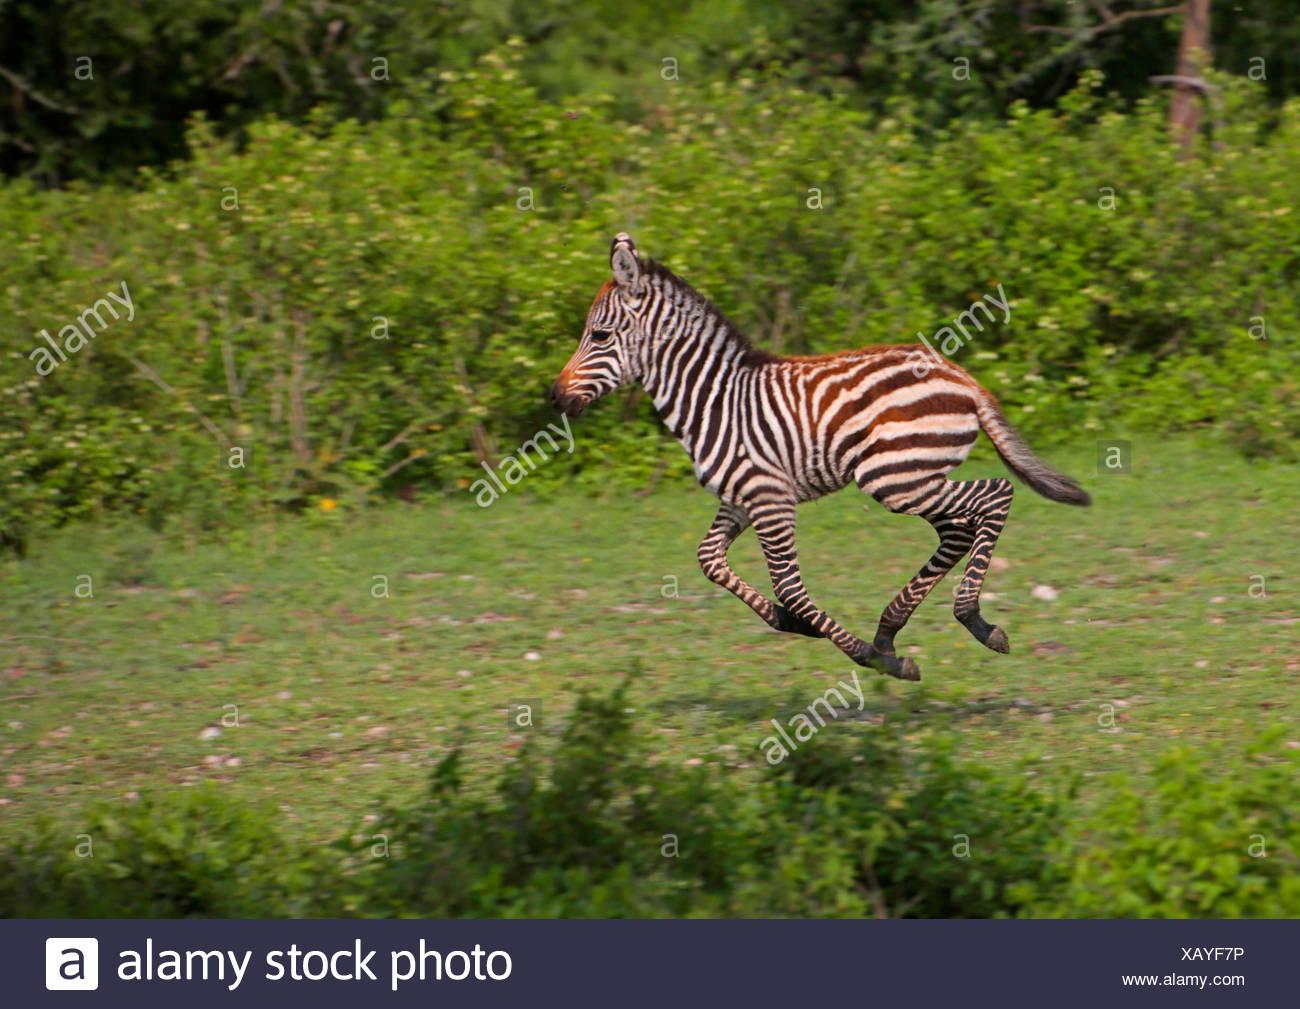 Gemeinsamen Zebra (Equus Quagga), Fohlen im Verlauf in eine Wiese, Tansania, Serengeti Nationalpark Stockbild